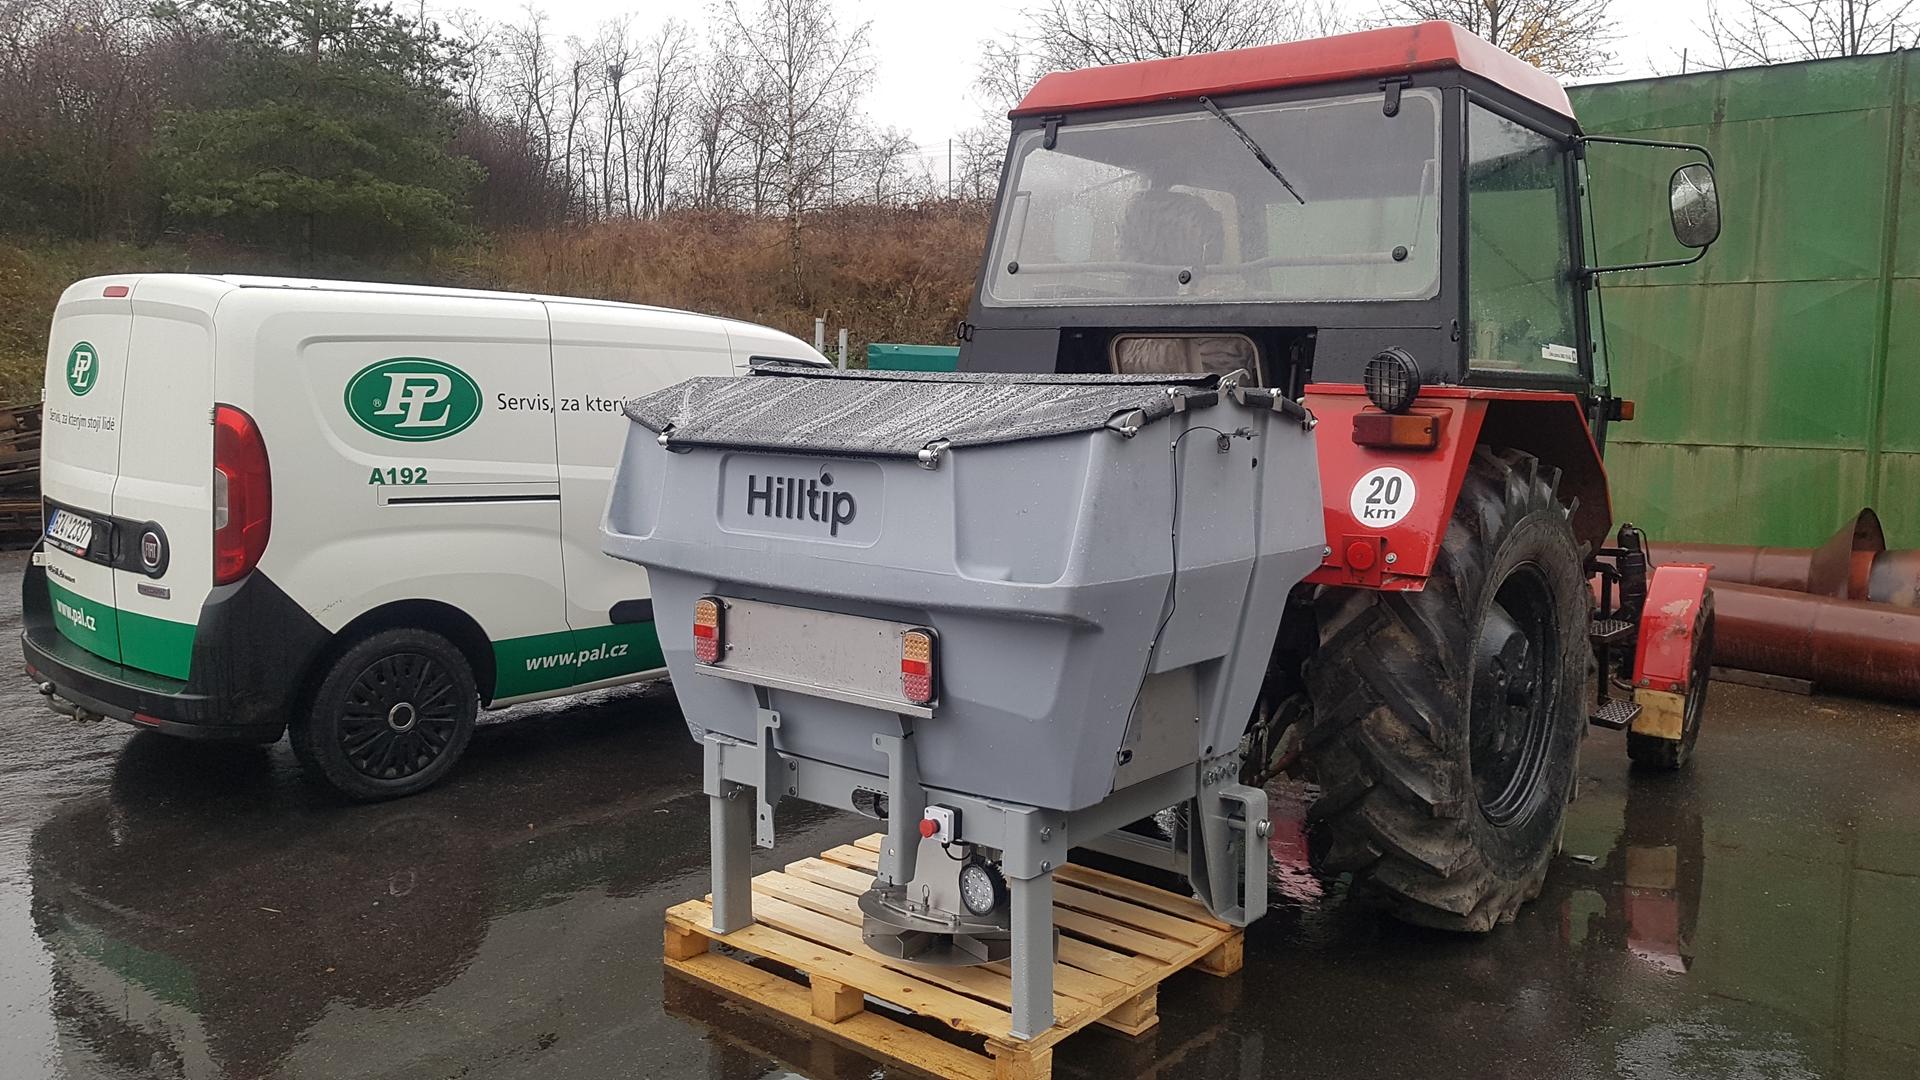 Hilltip-600TR-Obec-Rudikov-(2).jpg